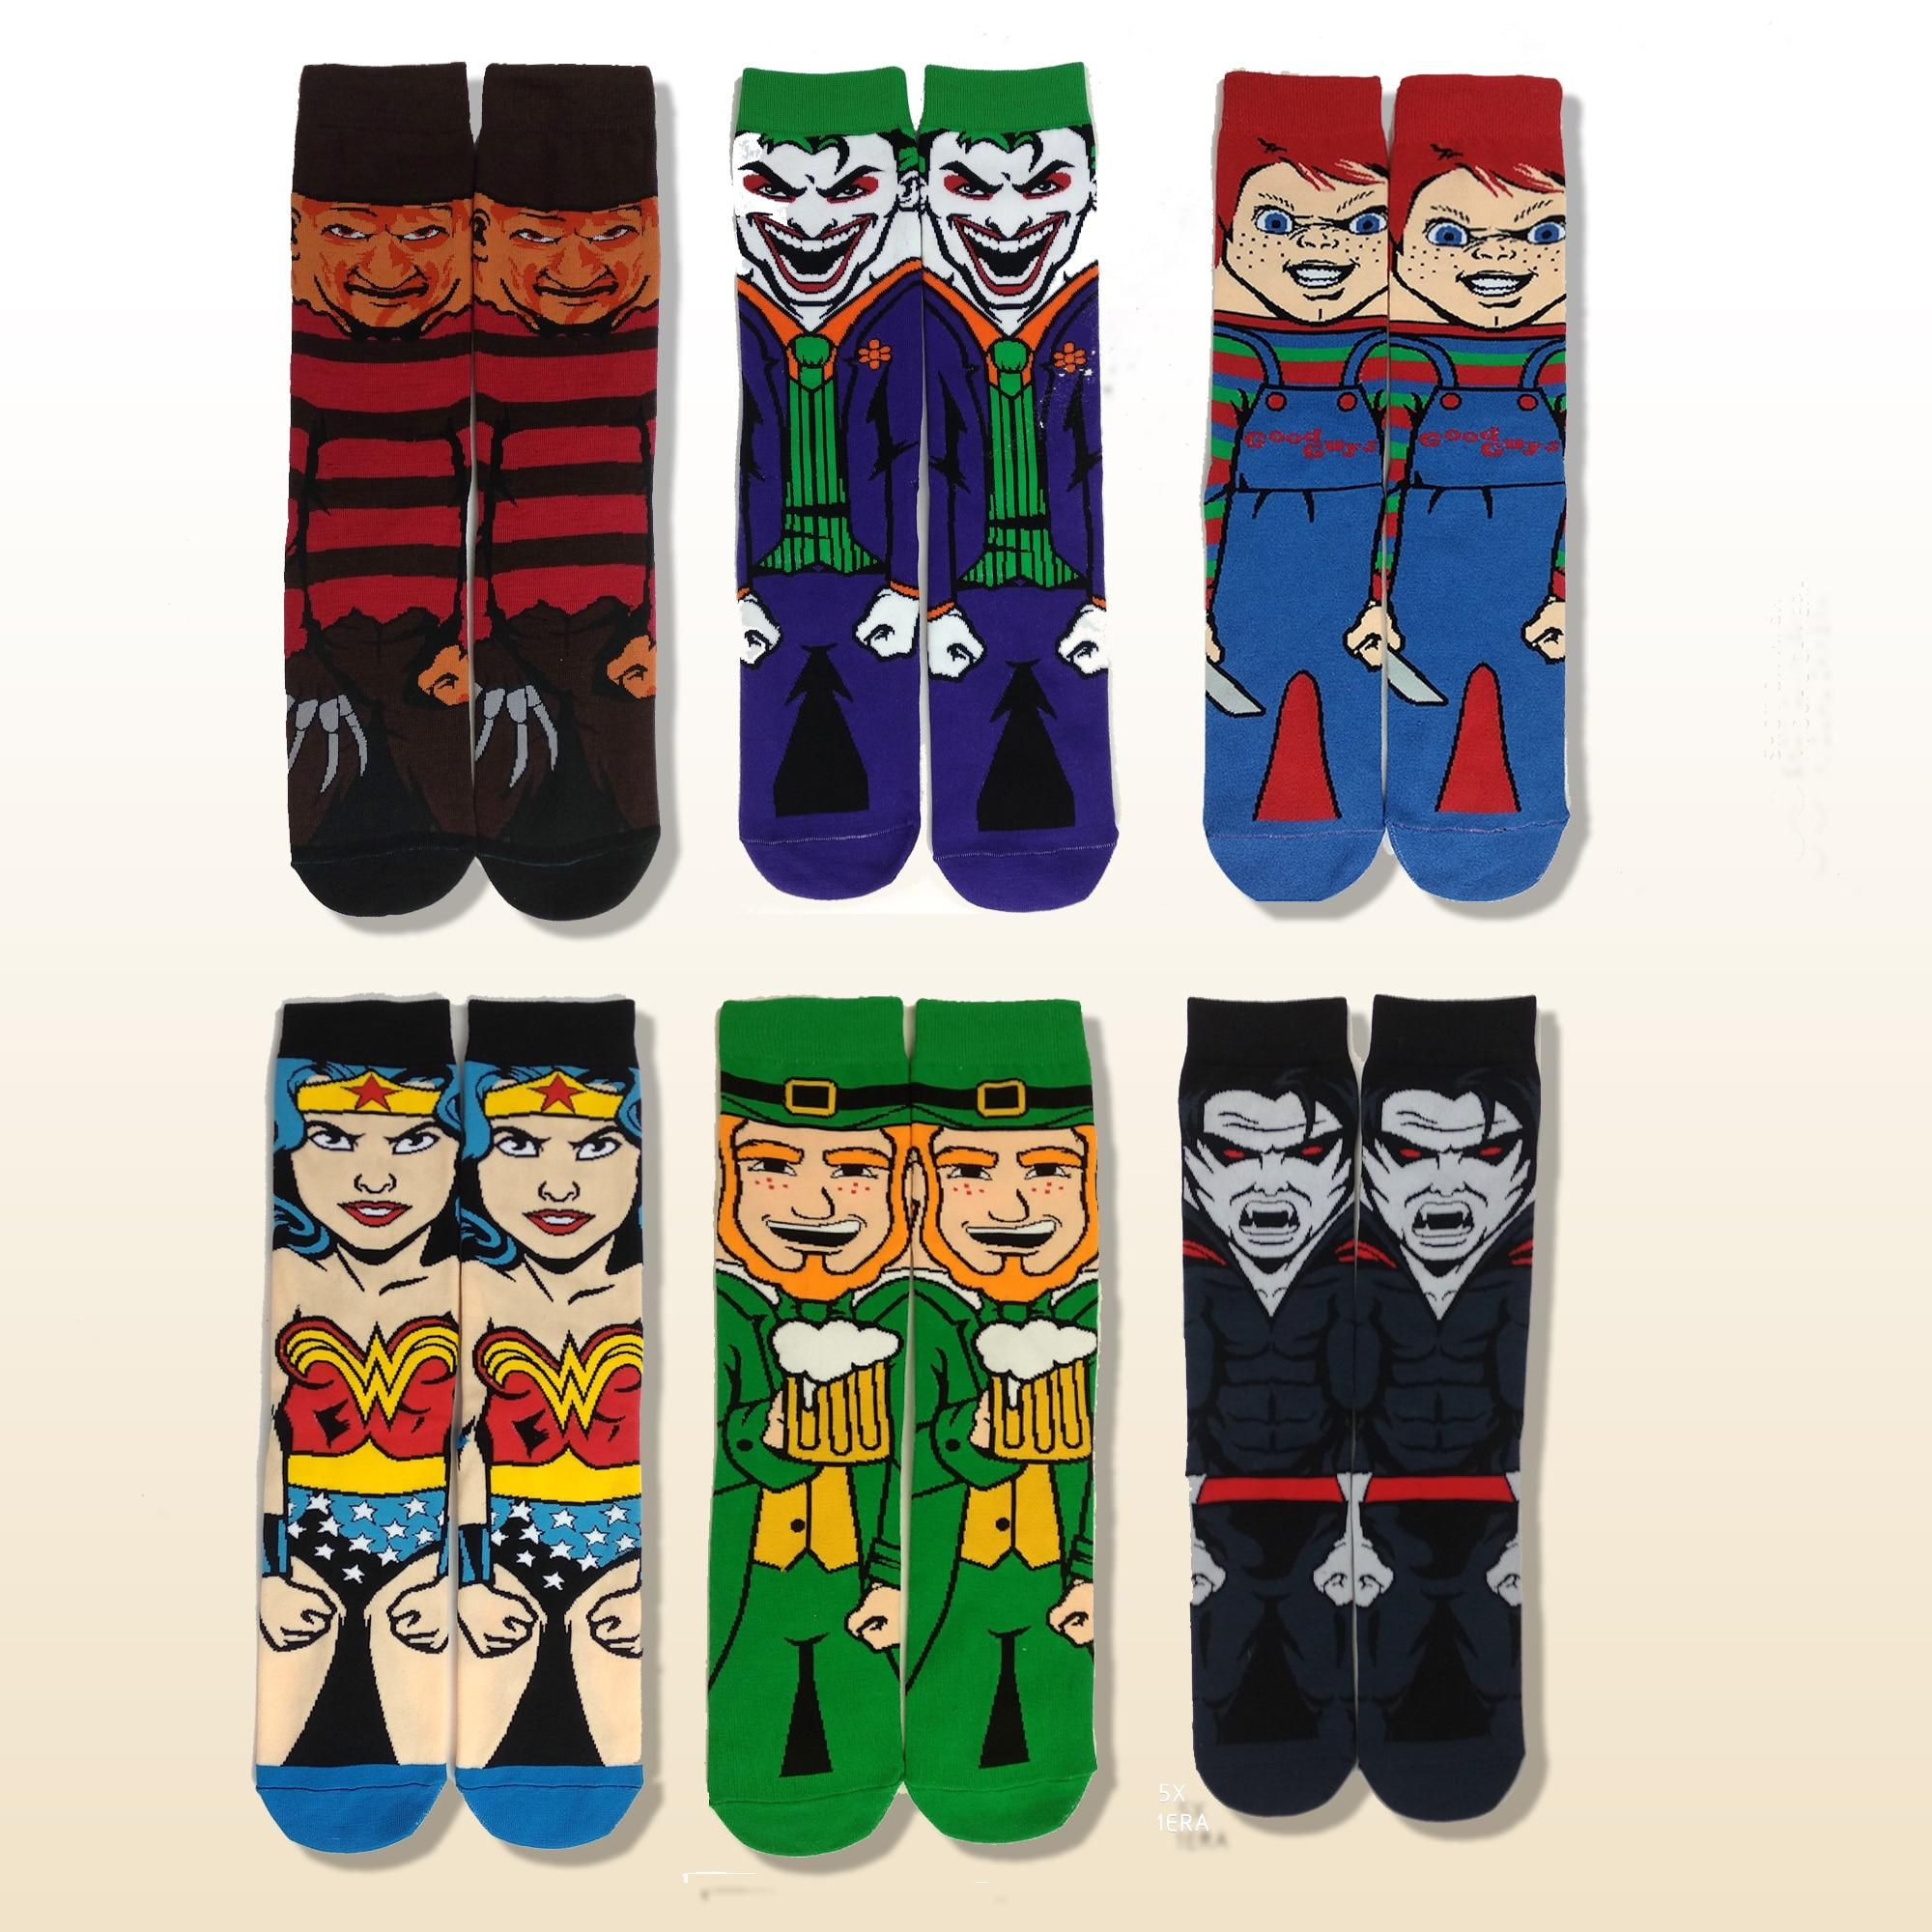 Cartoon Anime Horrible Movie Skateboard Socks Cotton Crazy Stocking Sock Personality Popular Summer Dress Socks носк